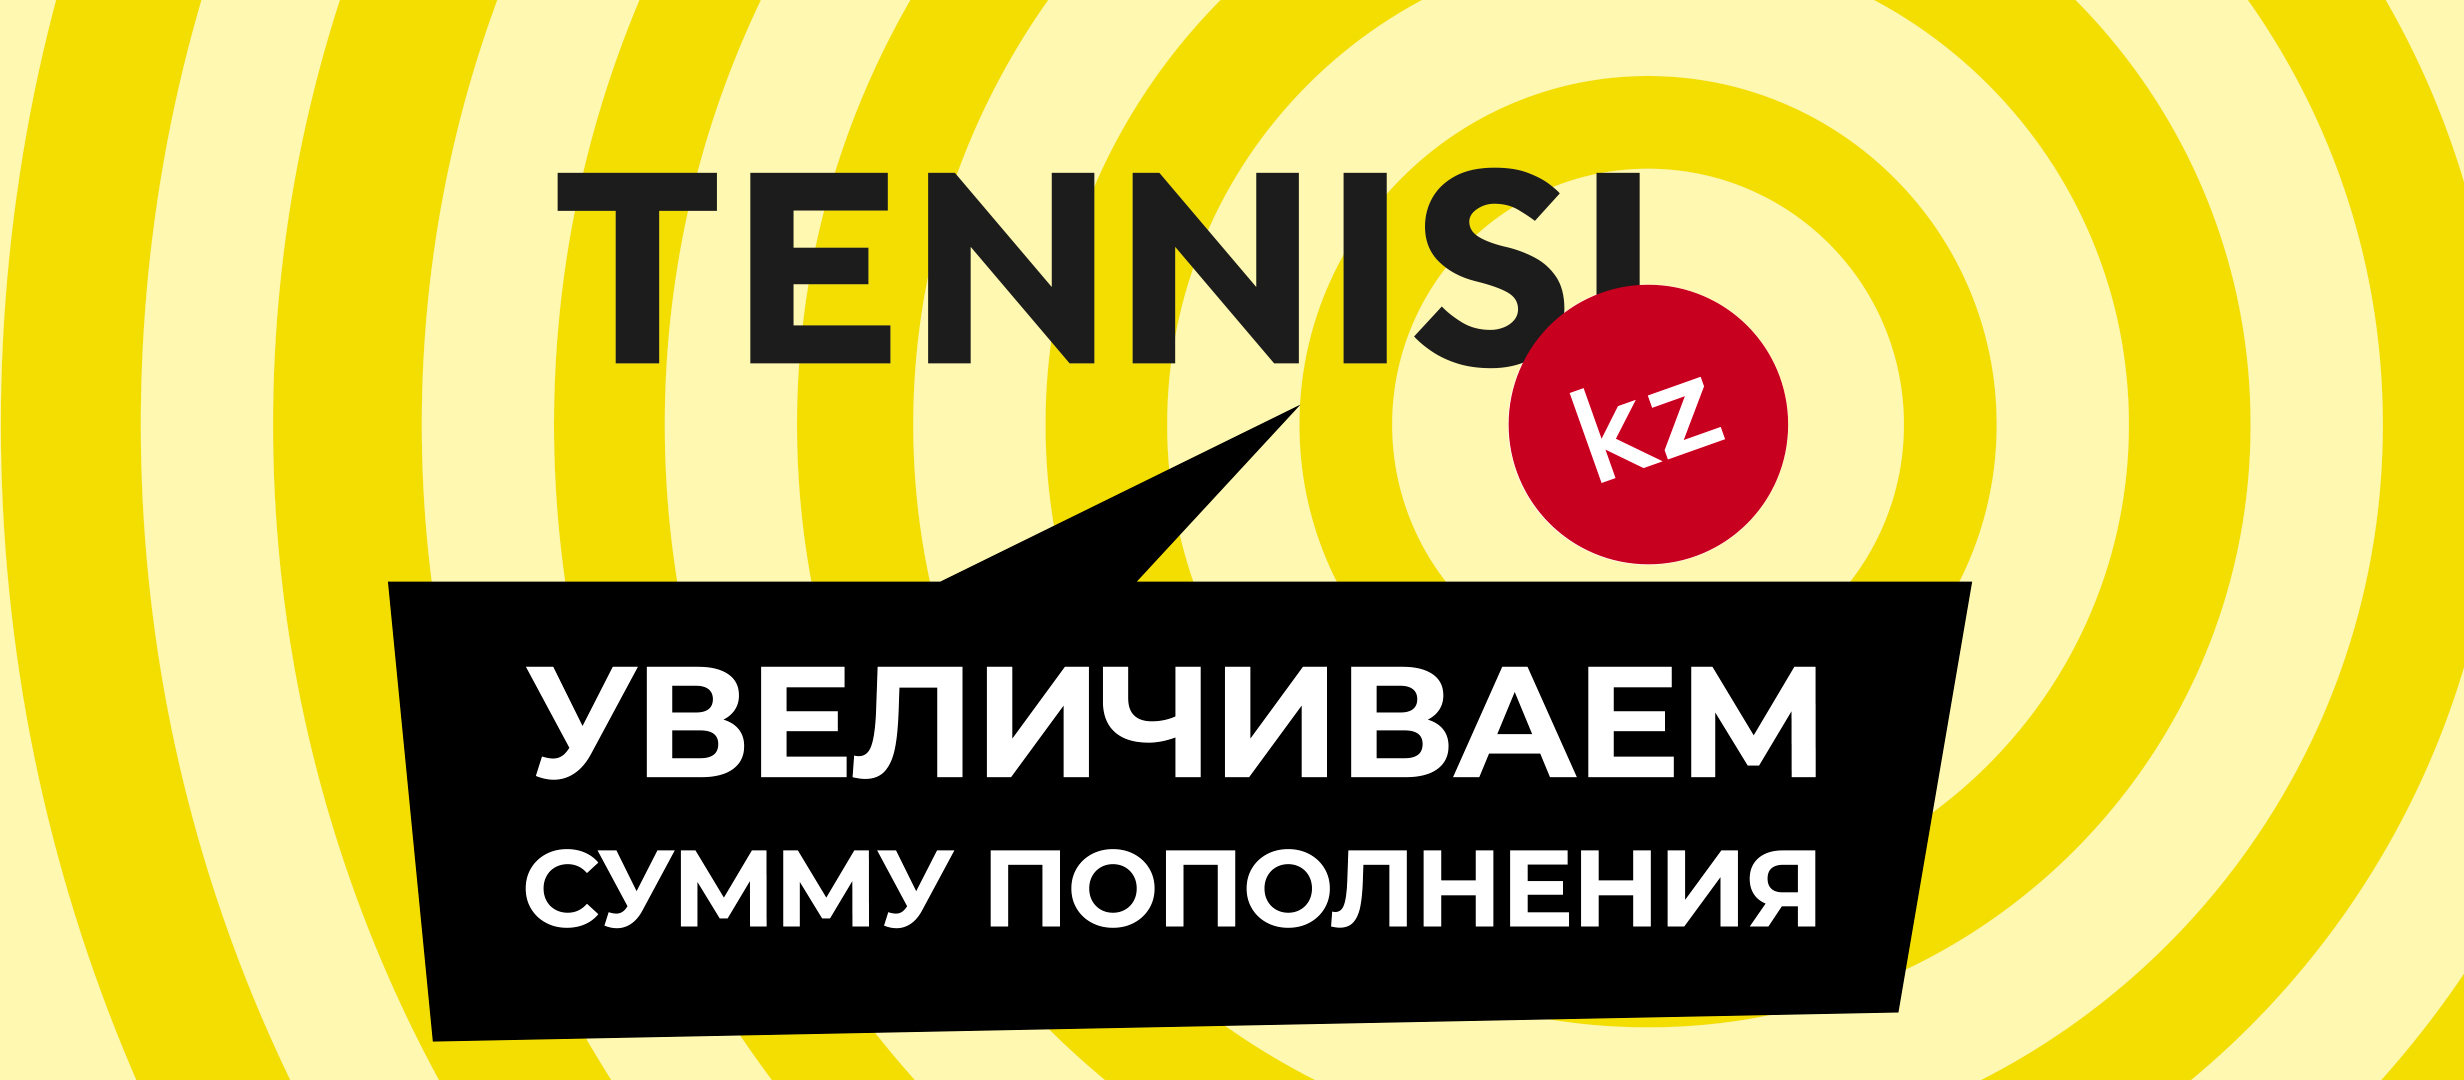 Кеш-бонус от Тенниси.